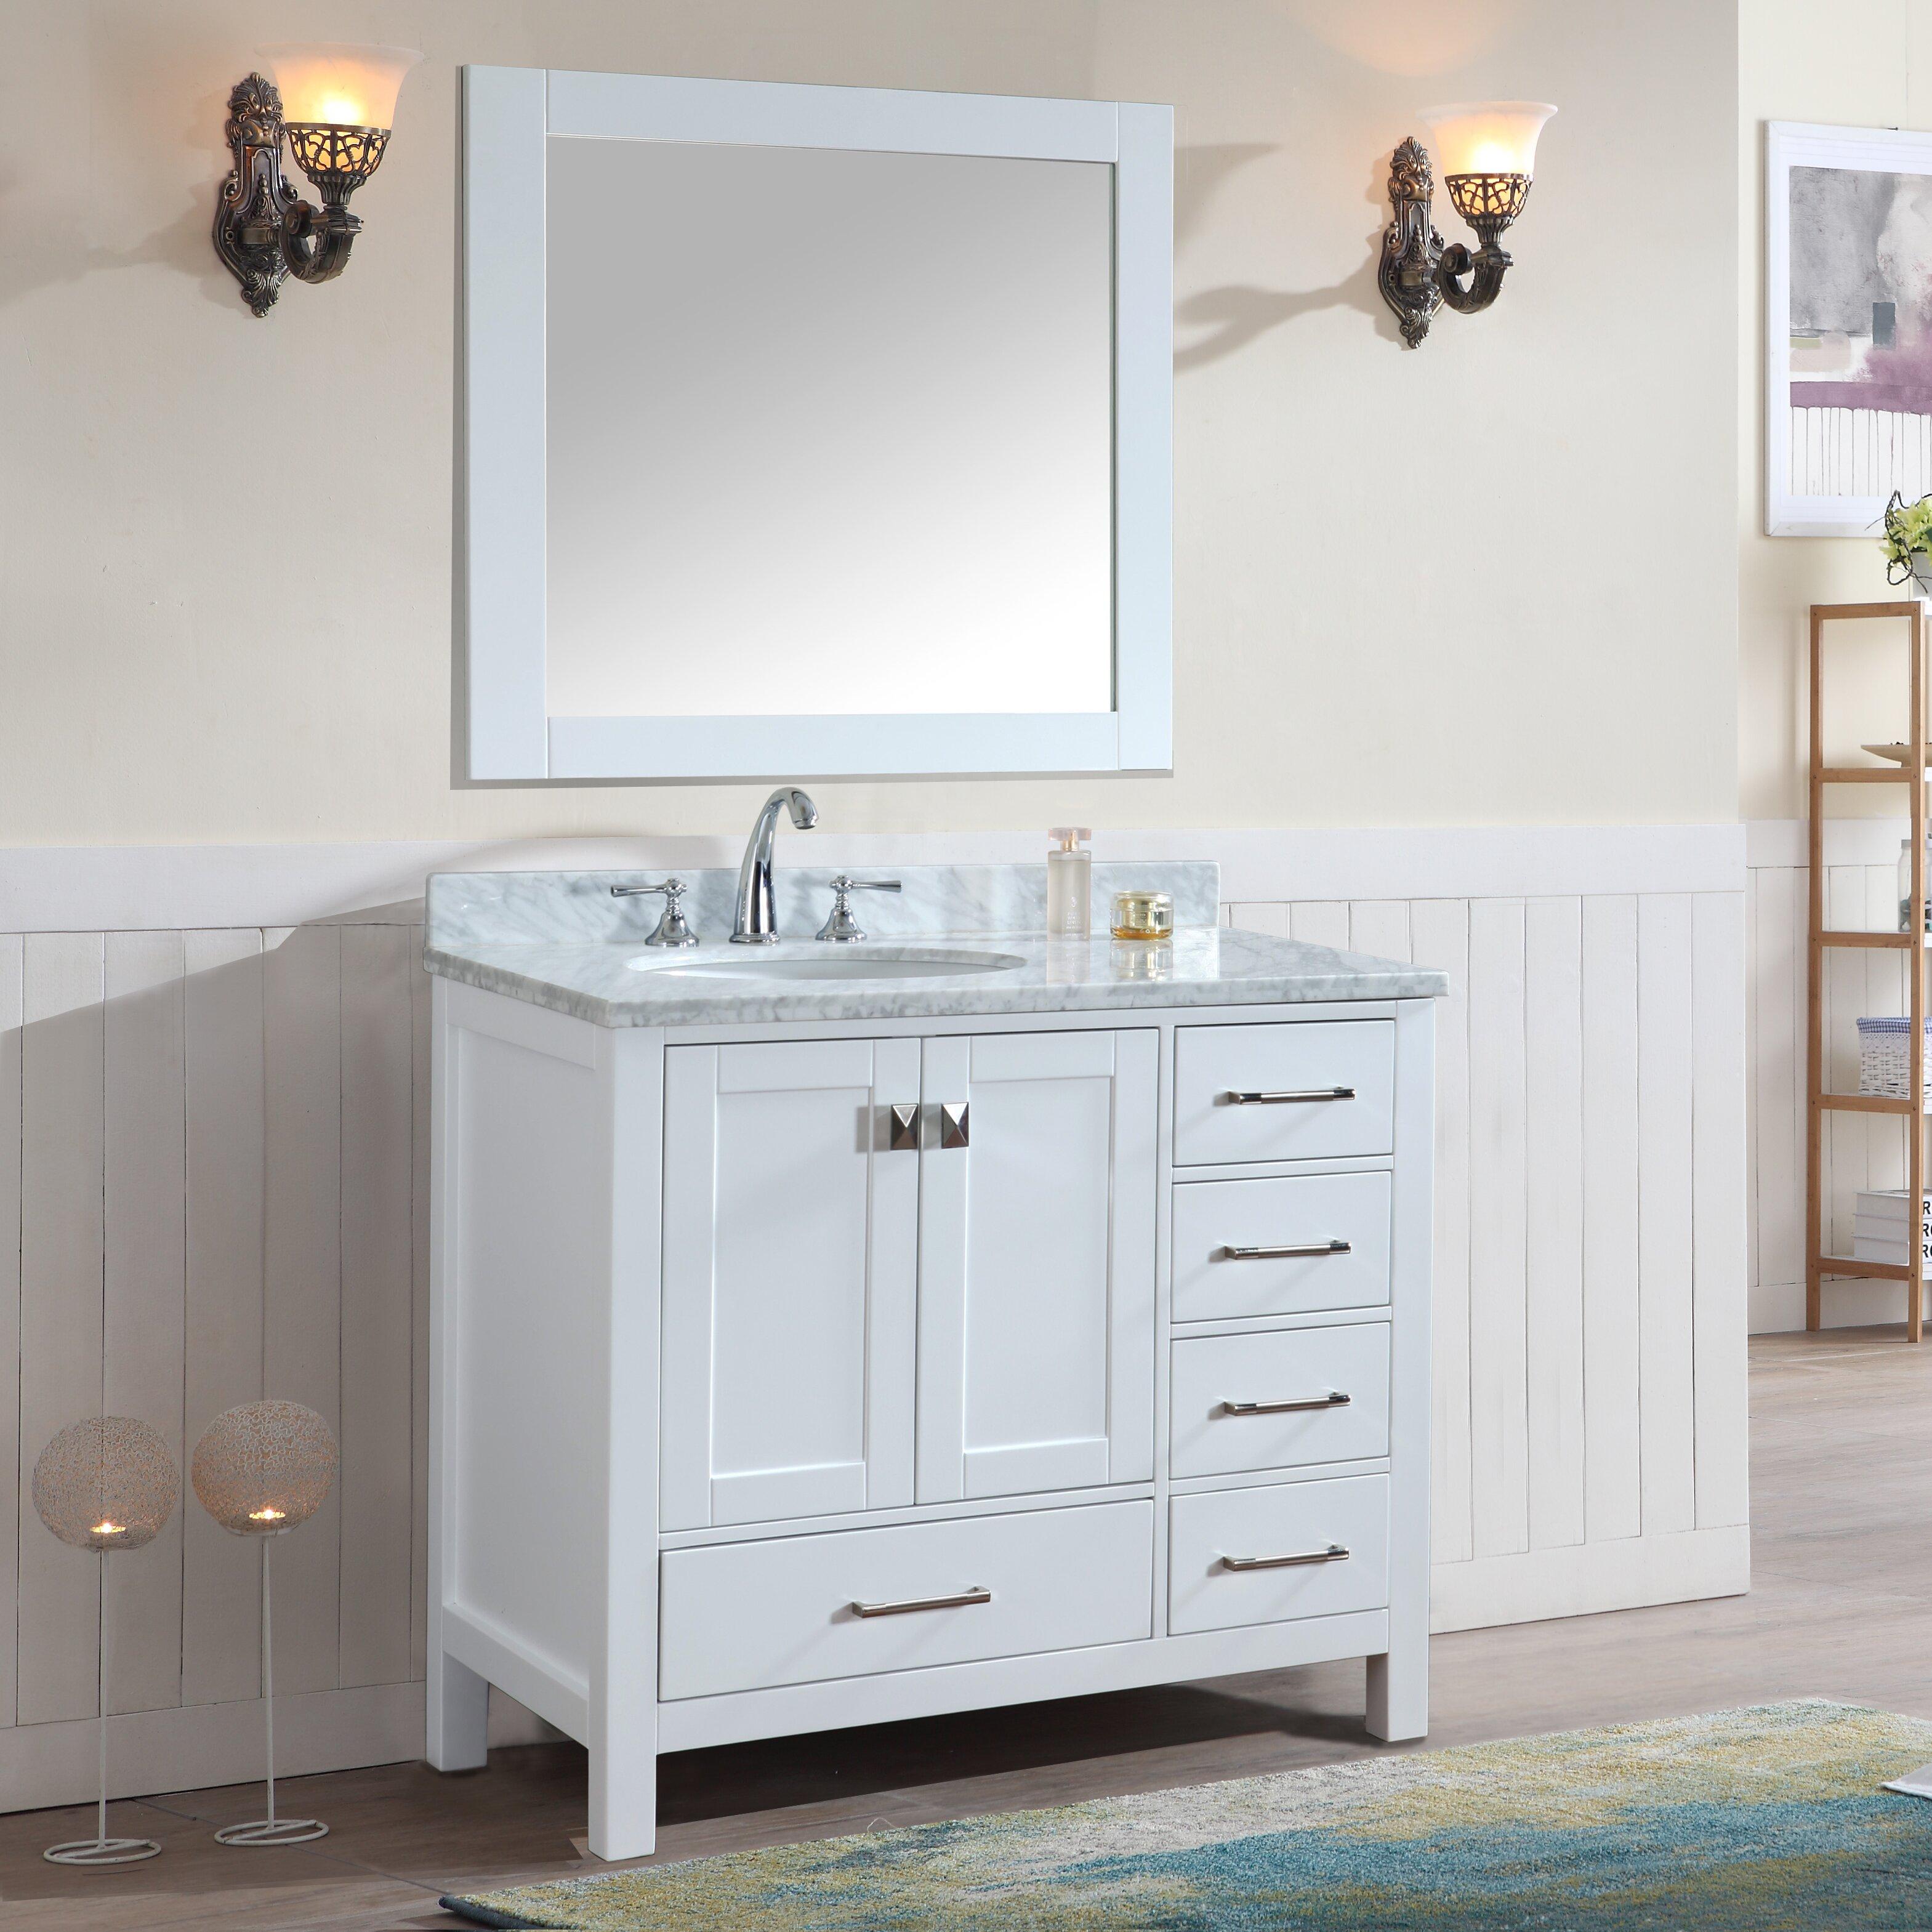 "Ari Kitchen & Bath Bella 36"" Single Bathroom Vanity Set"